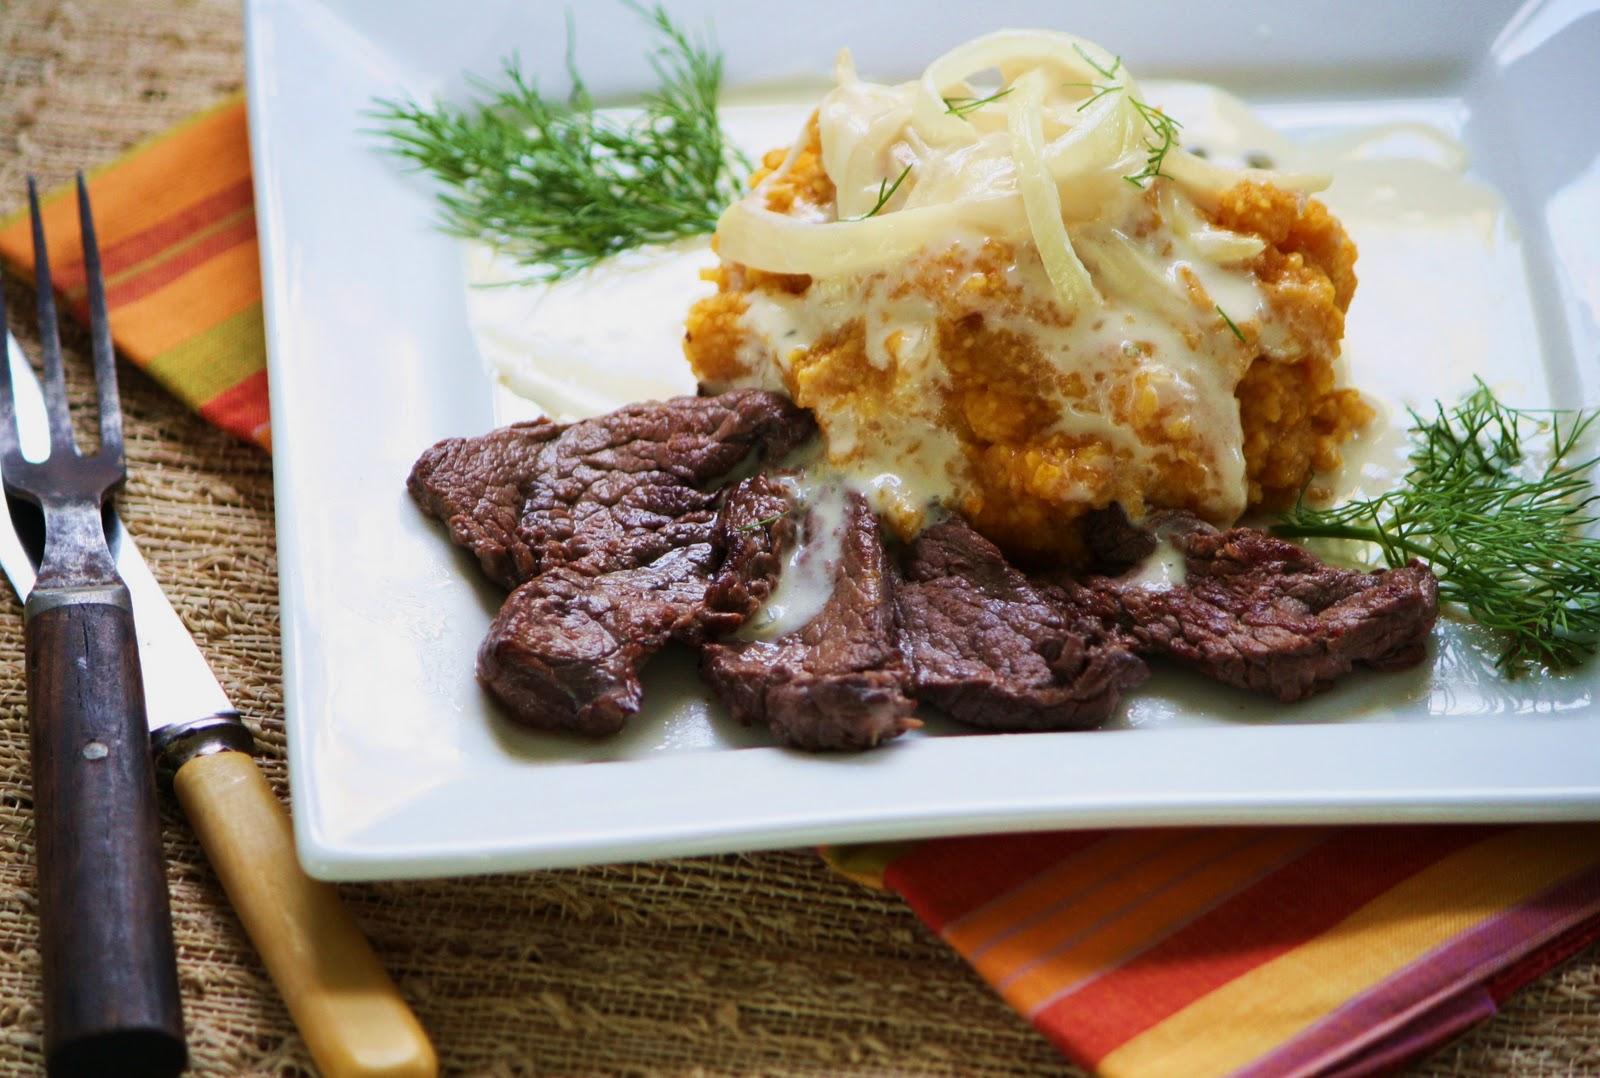 Karoo Roast ostrich steak: National Dish of Eswatini